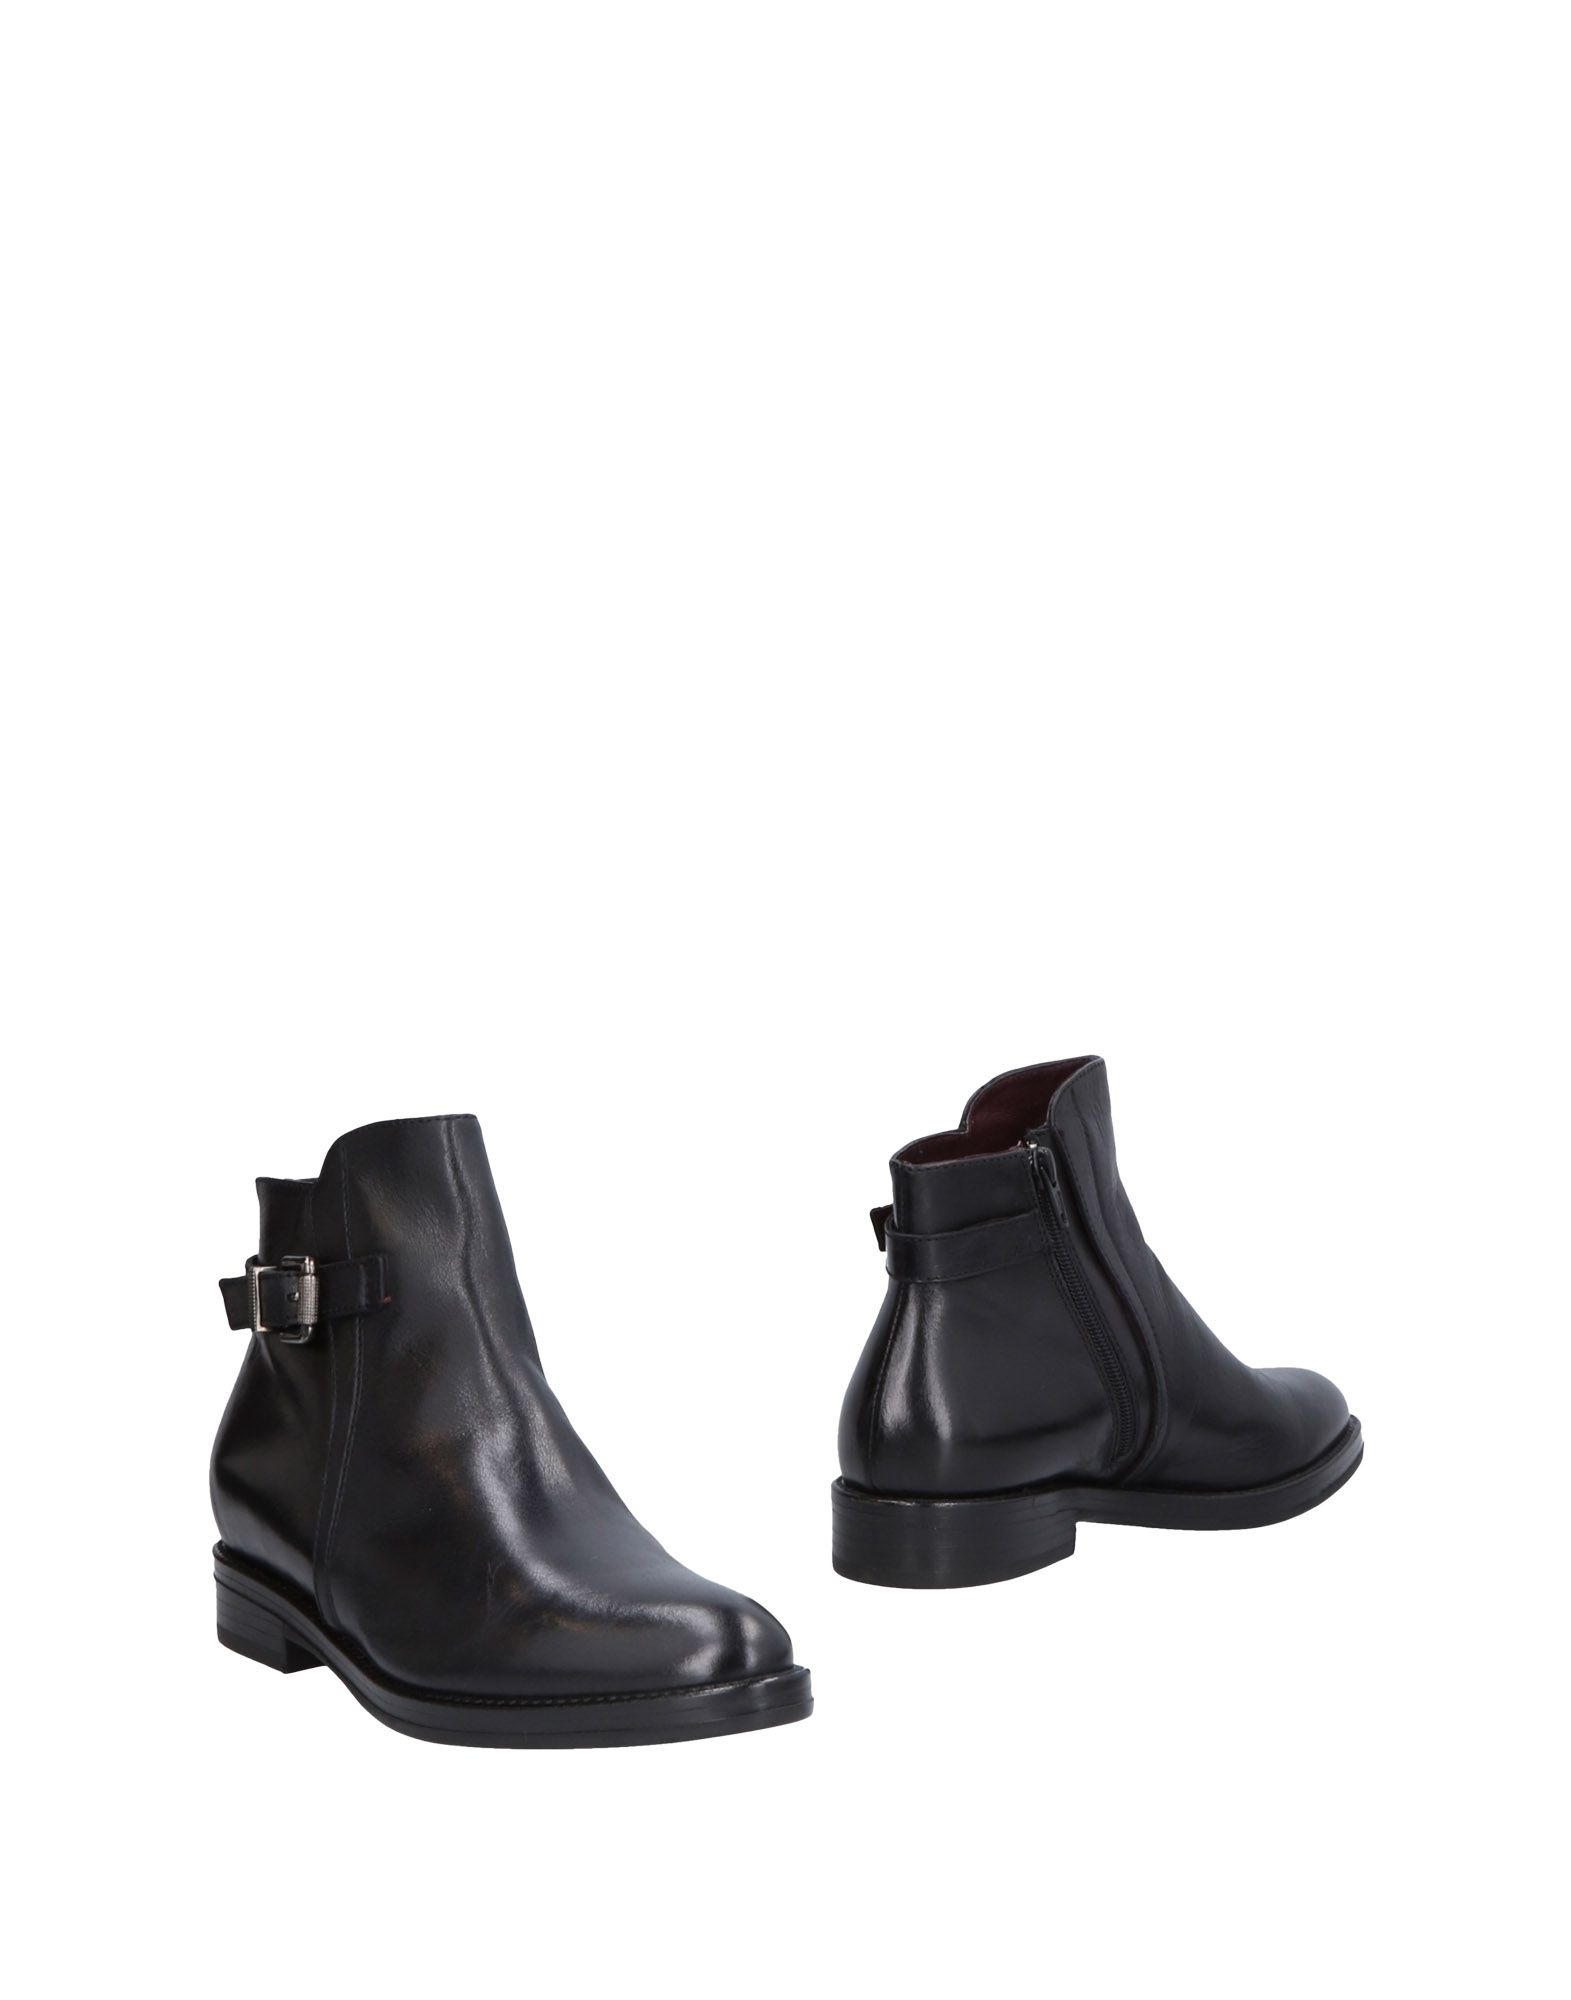 Donna Più Stiefelette Damen beliebte  11464818CU Gute Qualität beliebte Damen Schuhe 60e8fe